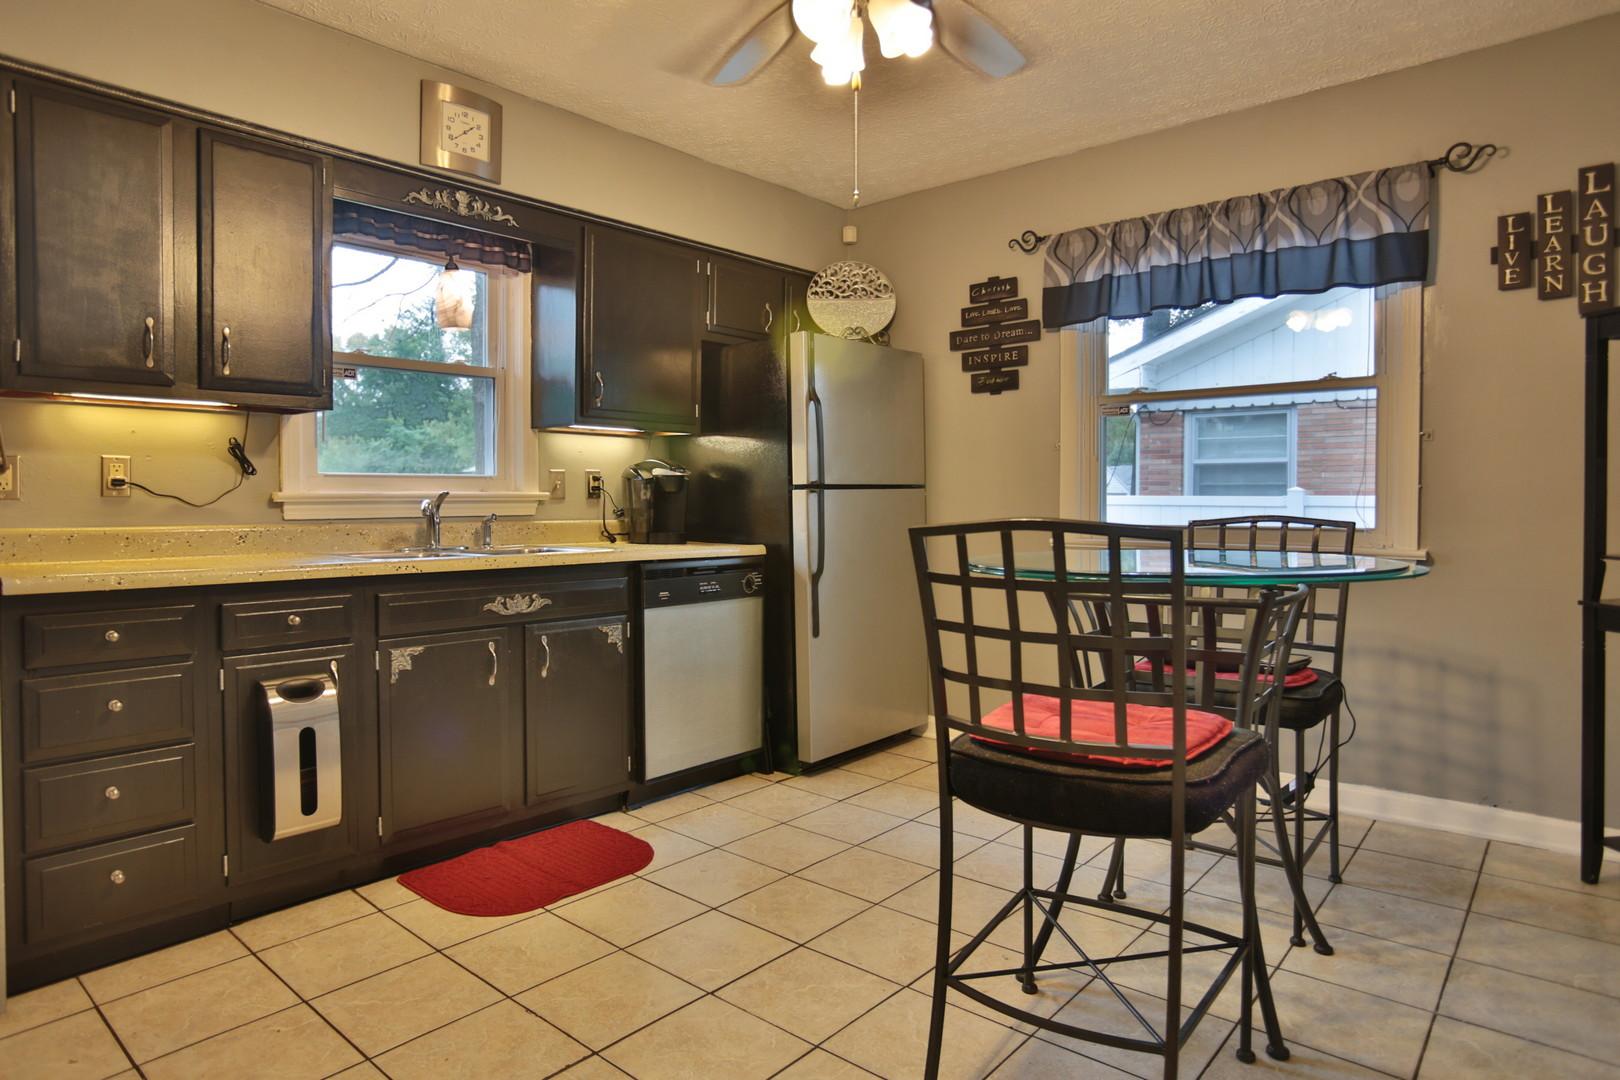 4033 Addison Lane Louisville, KY 40216 Kitchen